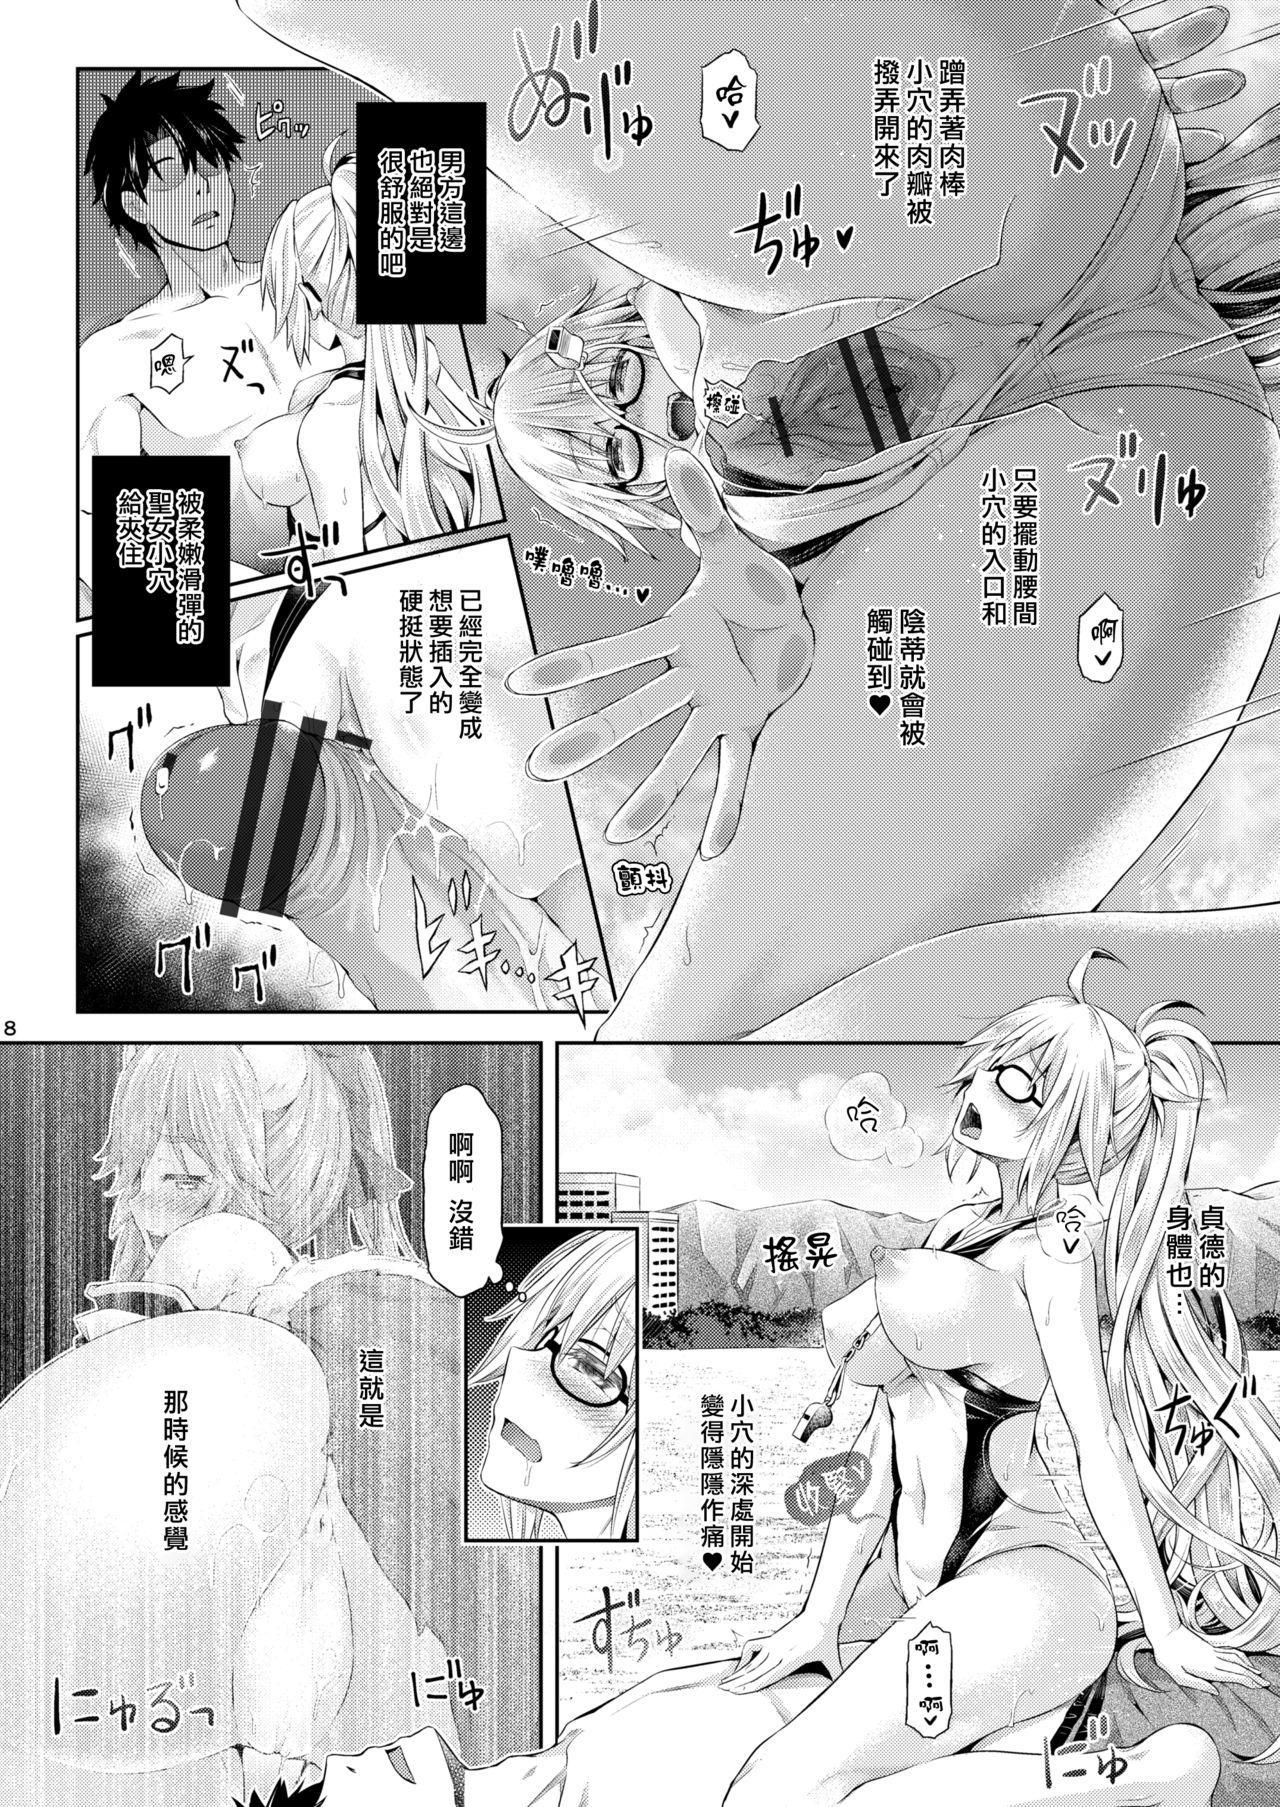 [Dschinghis Khan no Tamanegi wa Ore no Yome (Taniguchi-san)] Kimi -Jeanne d'Arc- ni Naru 2 (Fate/Grand Order) [Chinese] [熊崎玉子汉化组] [Digital] 8